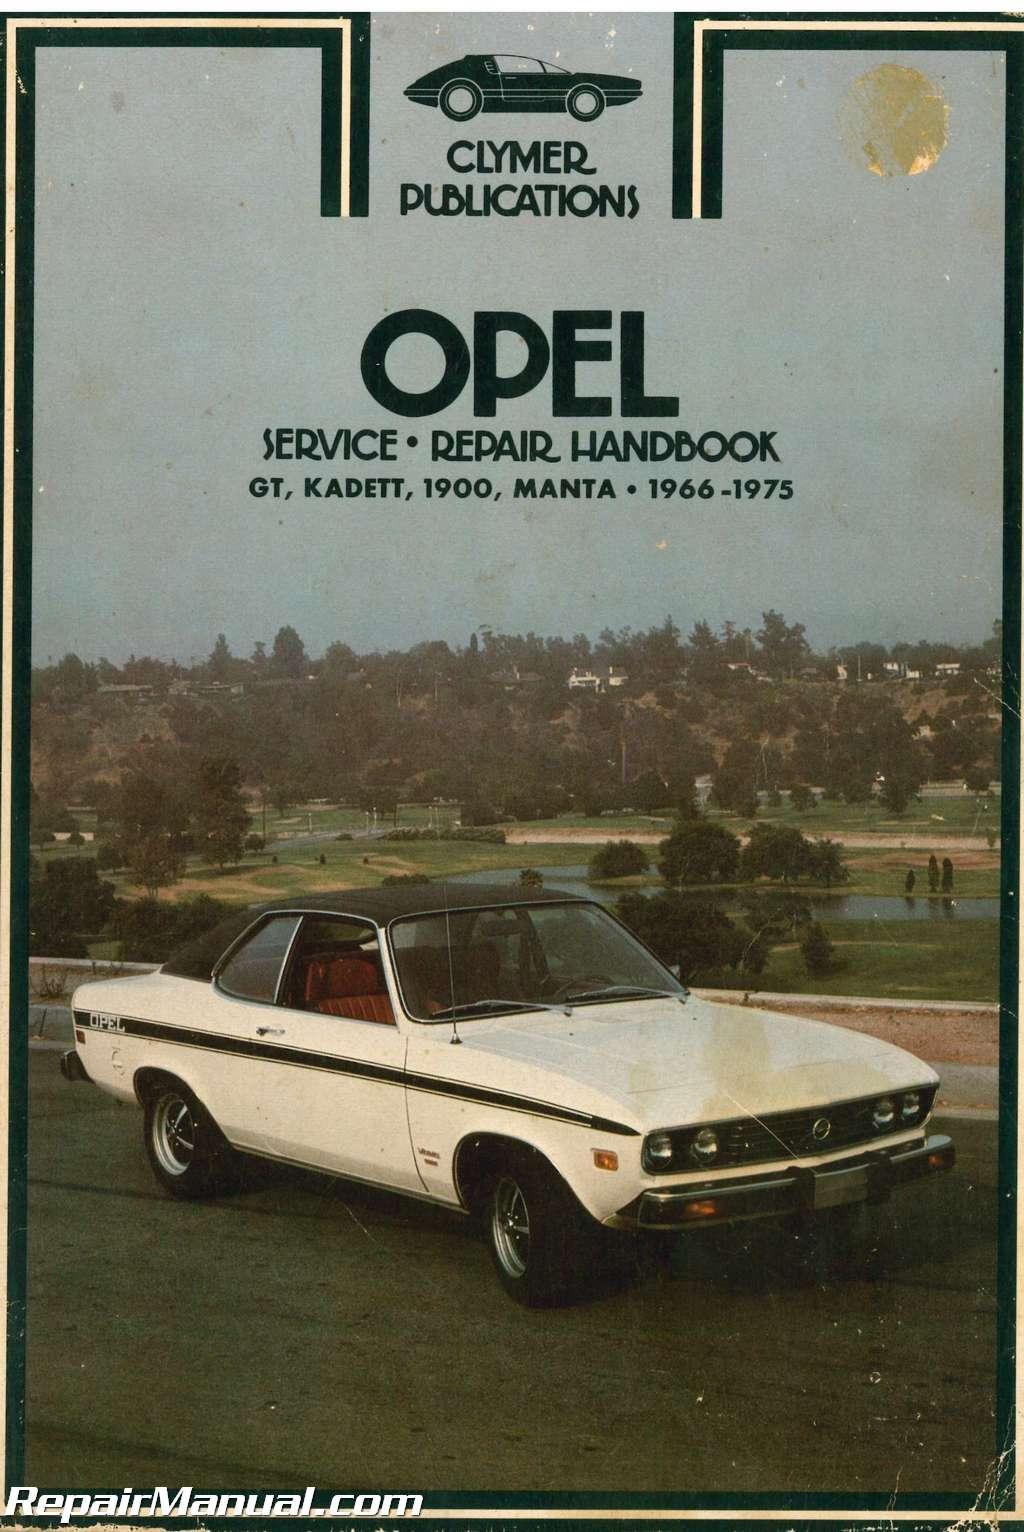 used clymer 1966 1975 opel gt kadett 1900 manta service manual rh repairmanual com Otawwa Workshop Manuals Ford Workshop Manuals